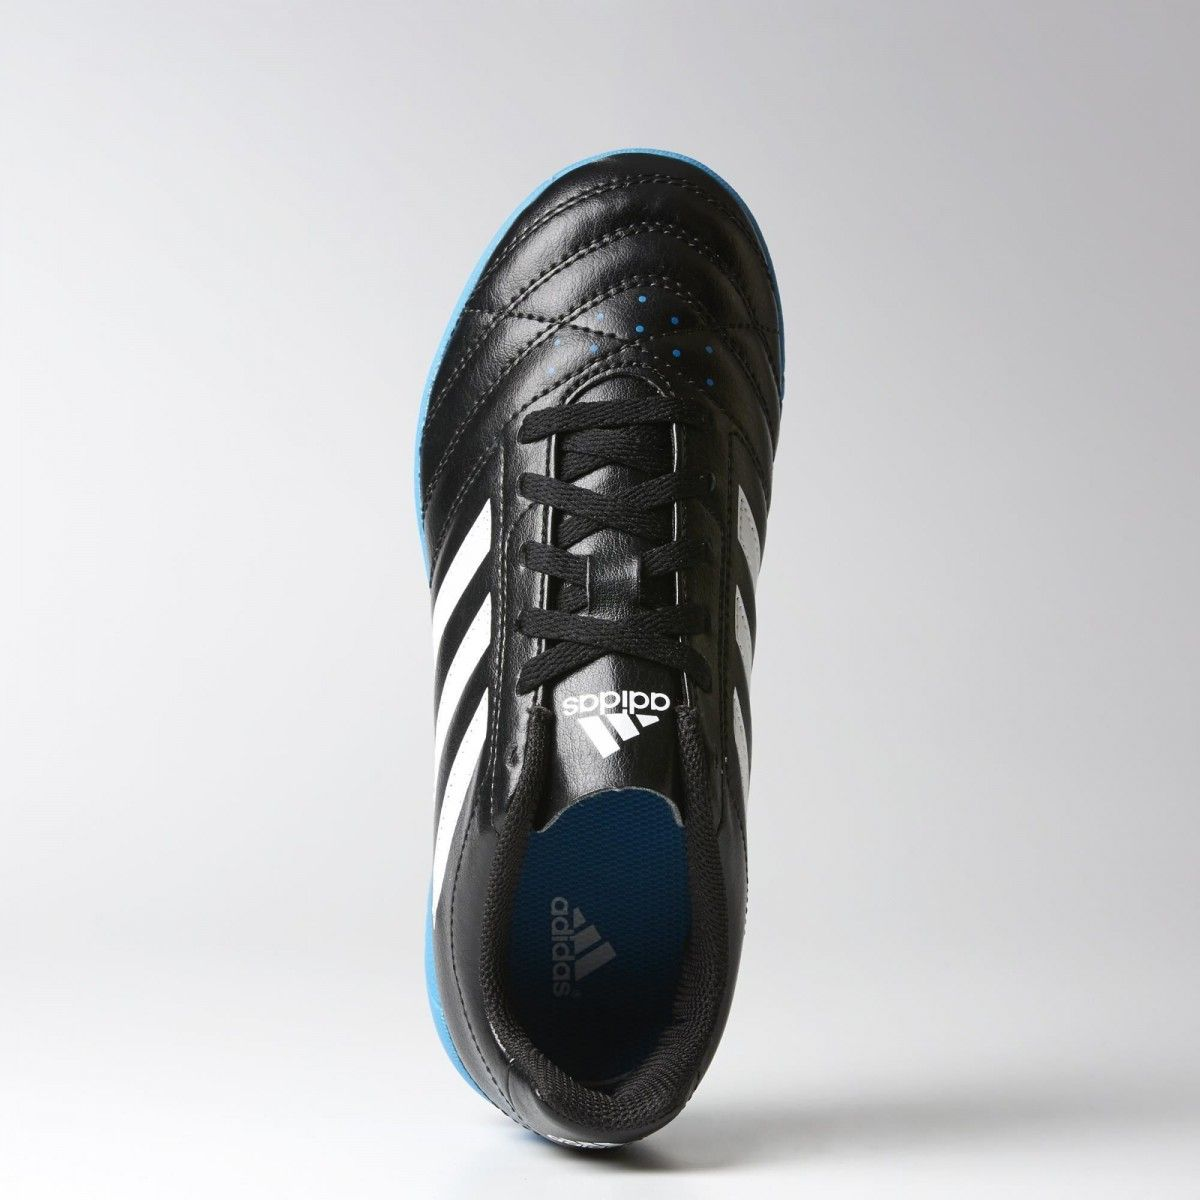 fc4f55e048 Adidas Goletto 5 Niño Futbol Cancha Sintetica Talla 35 - Importaciones West